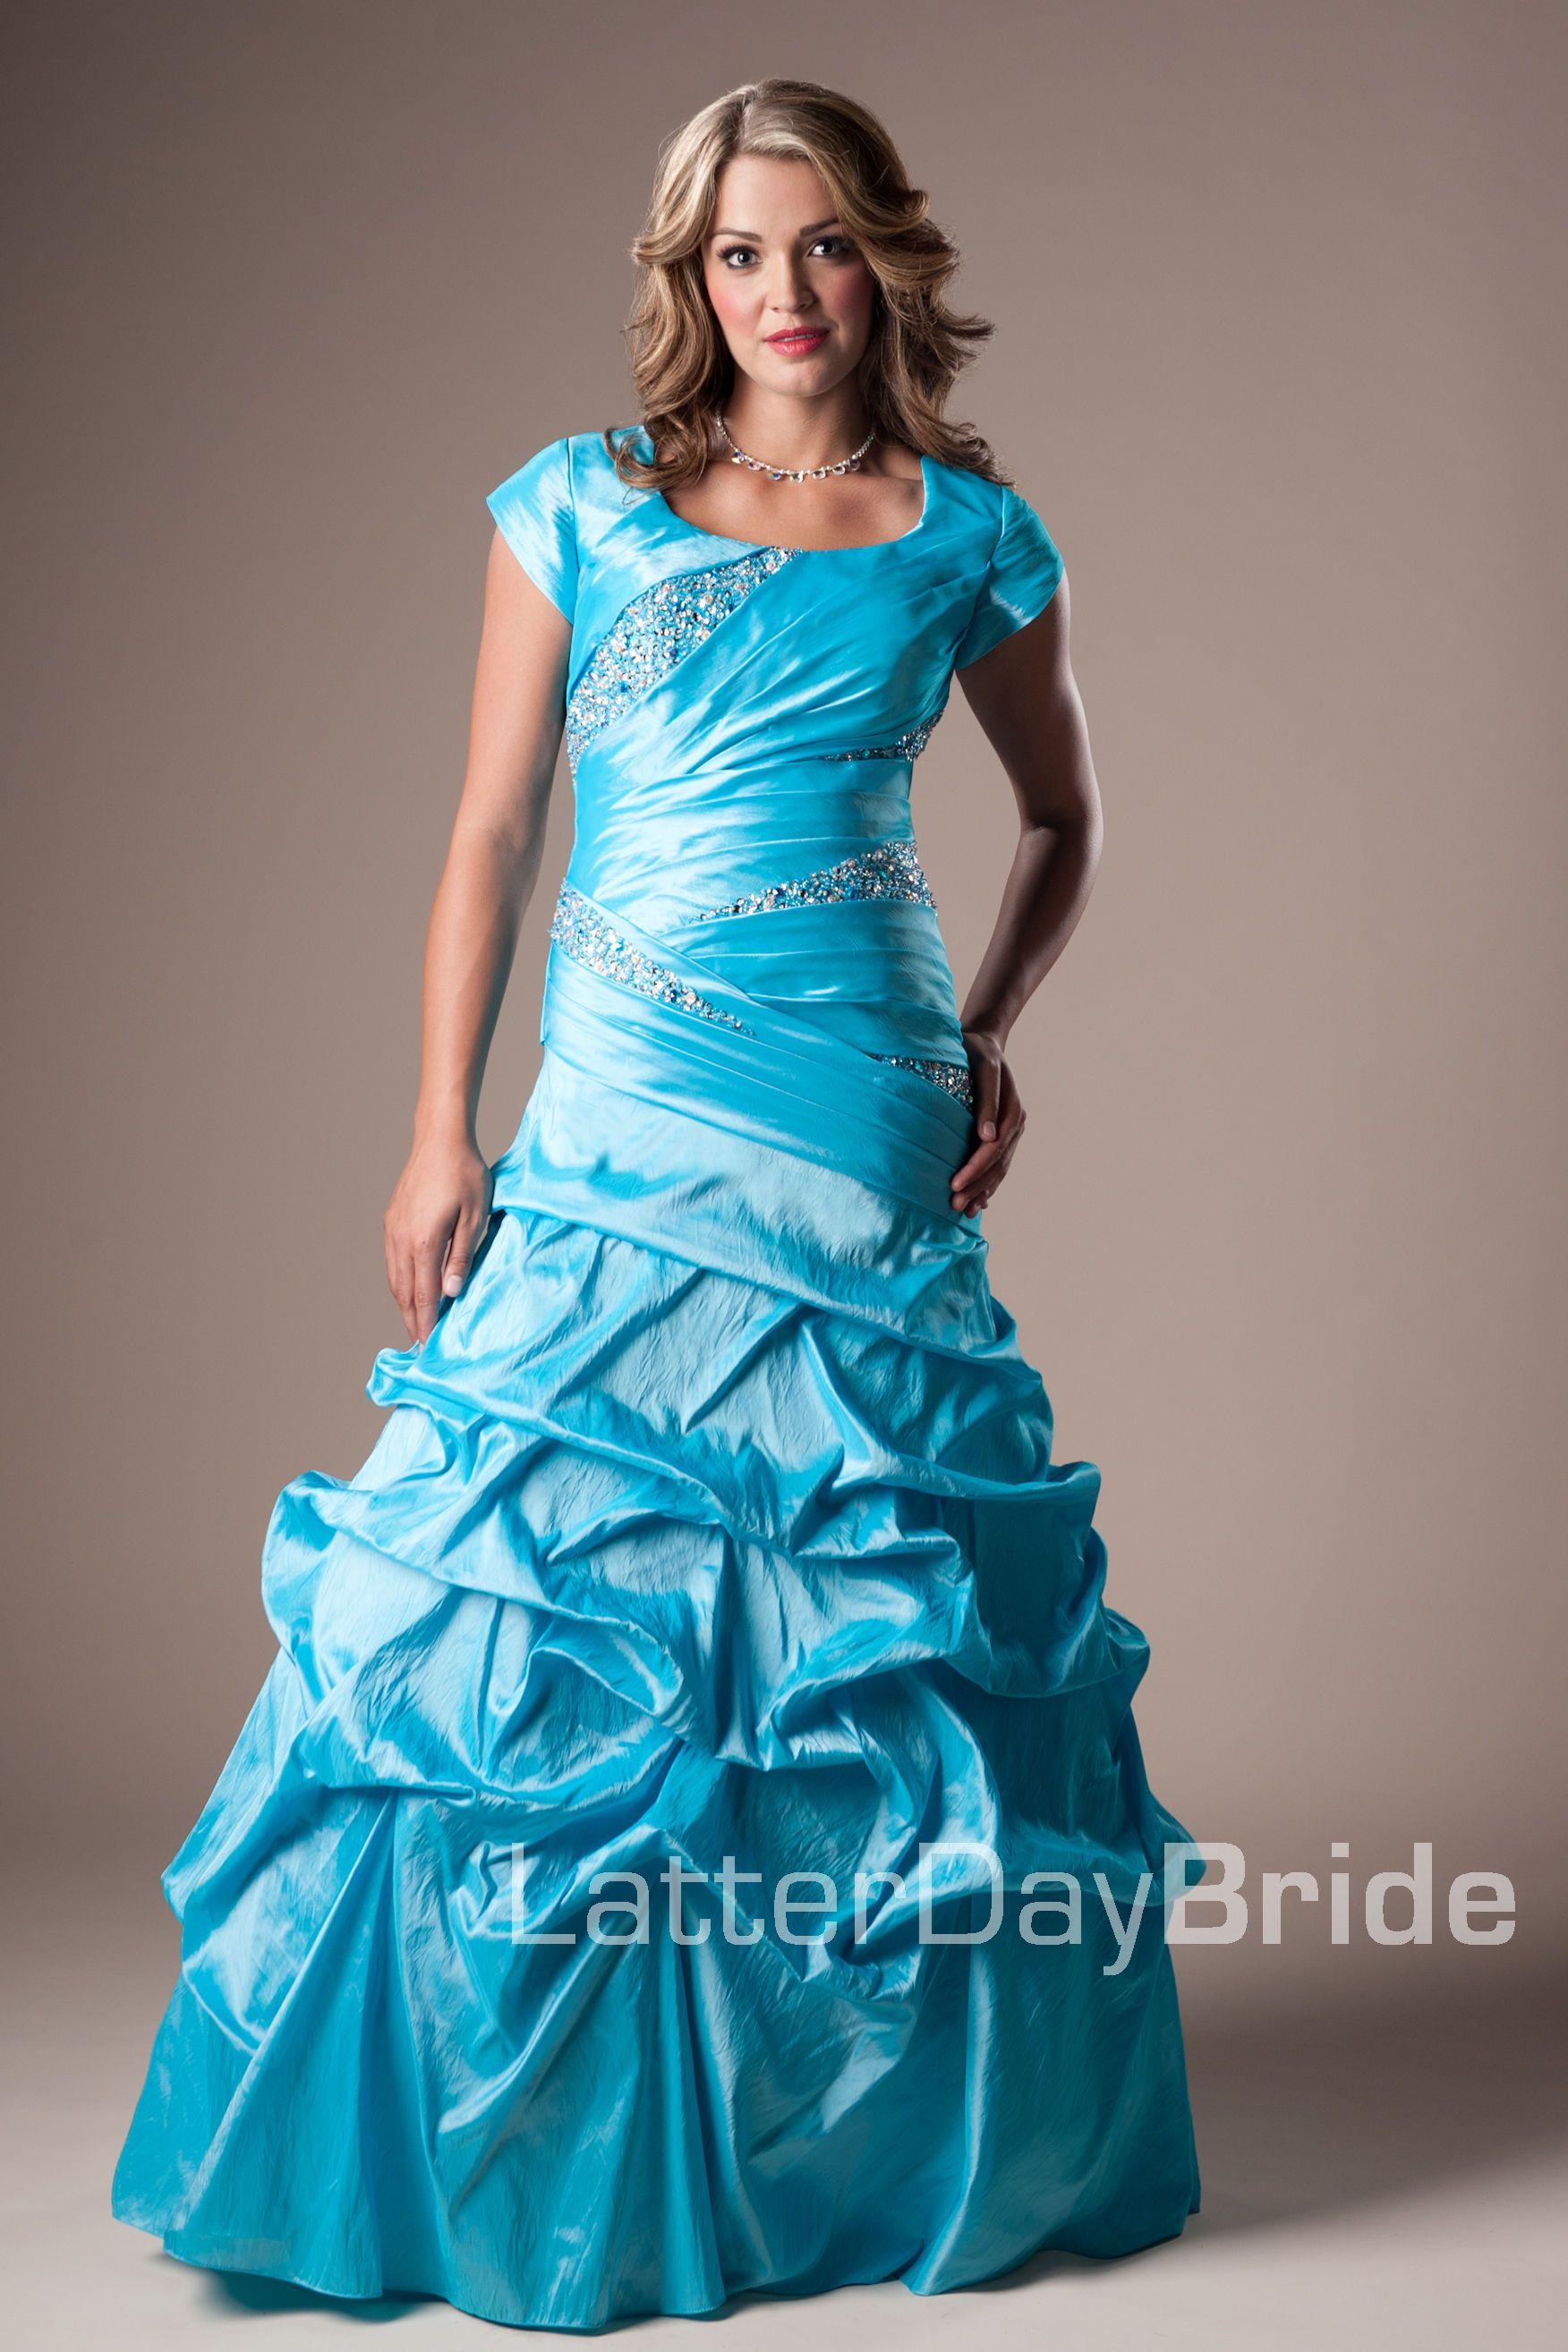 Bridesmaid & Prom, Regina | LatterDayBride & Prom -Modest Mormon LDS ...